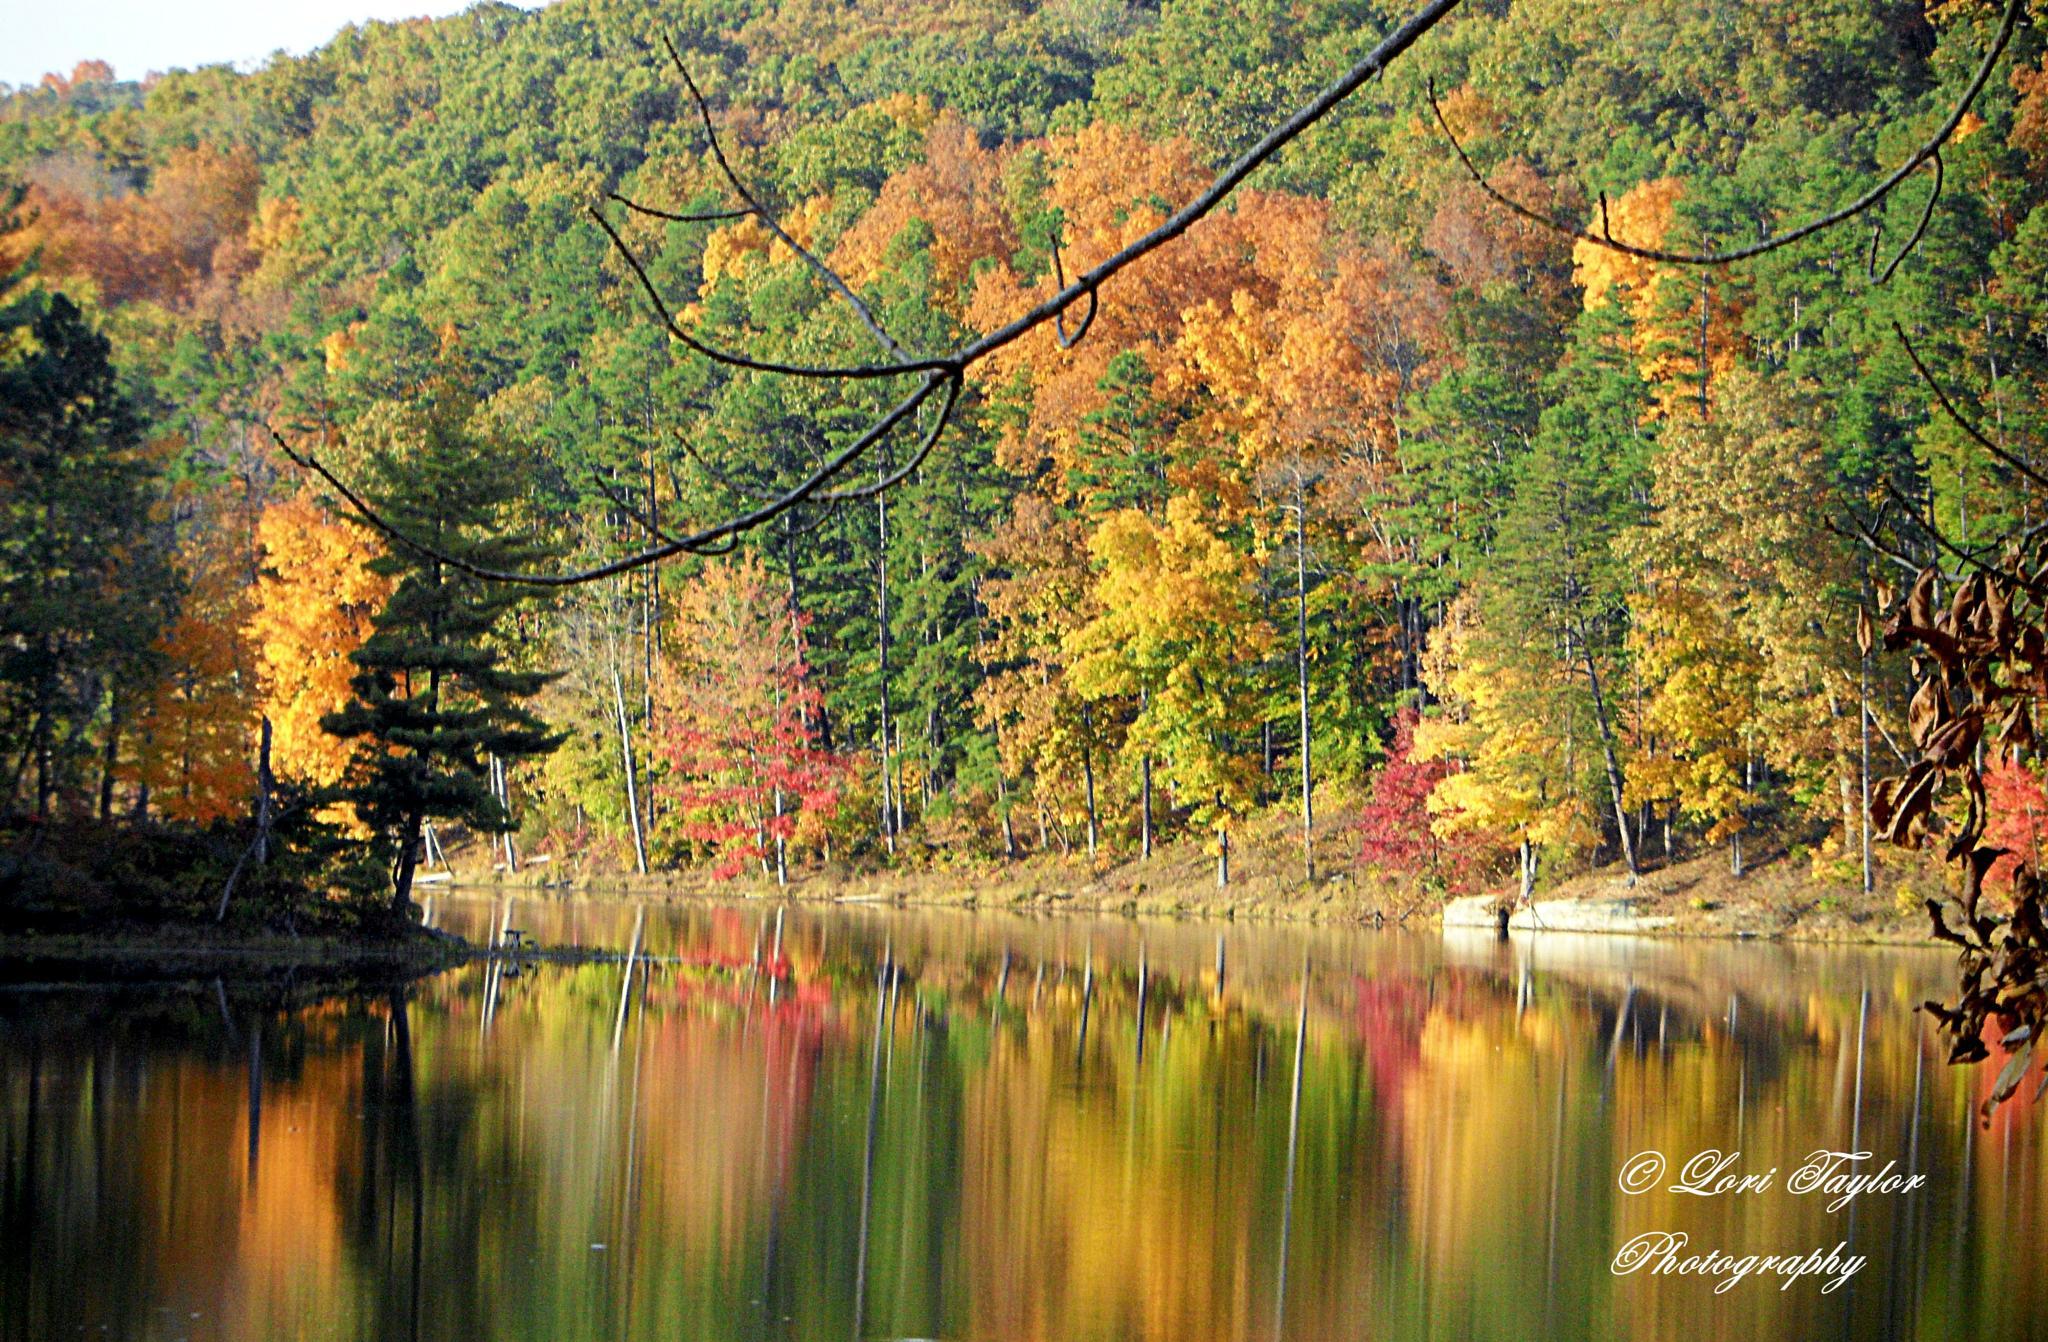 Lake Hope by Lori21929